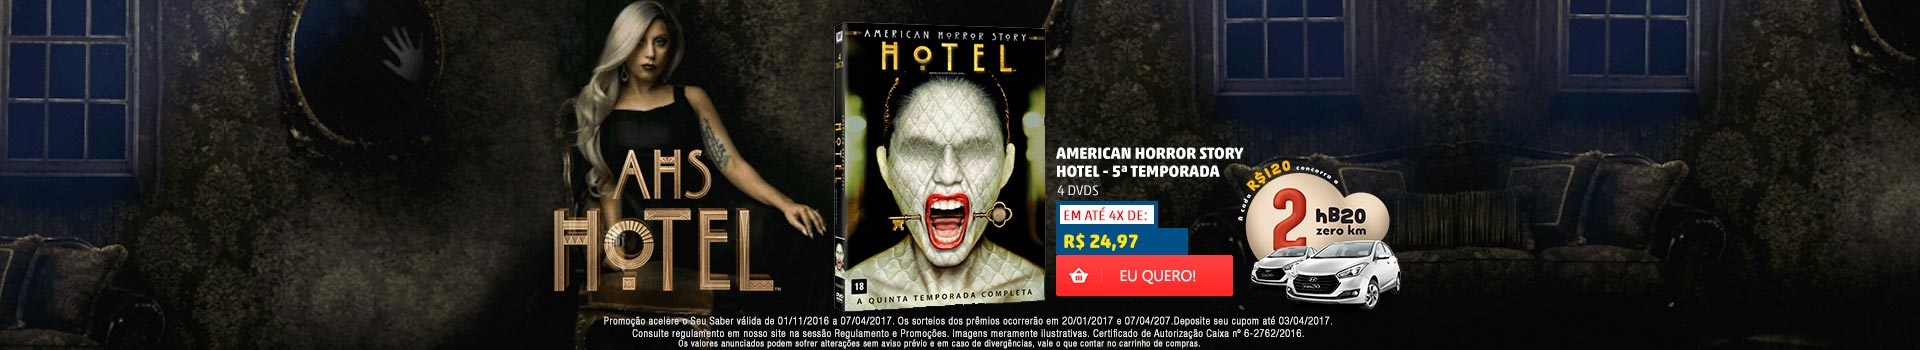 AHS - Hotel